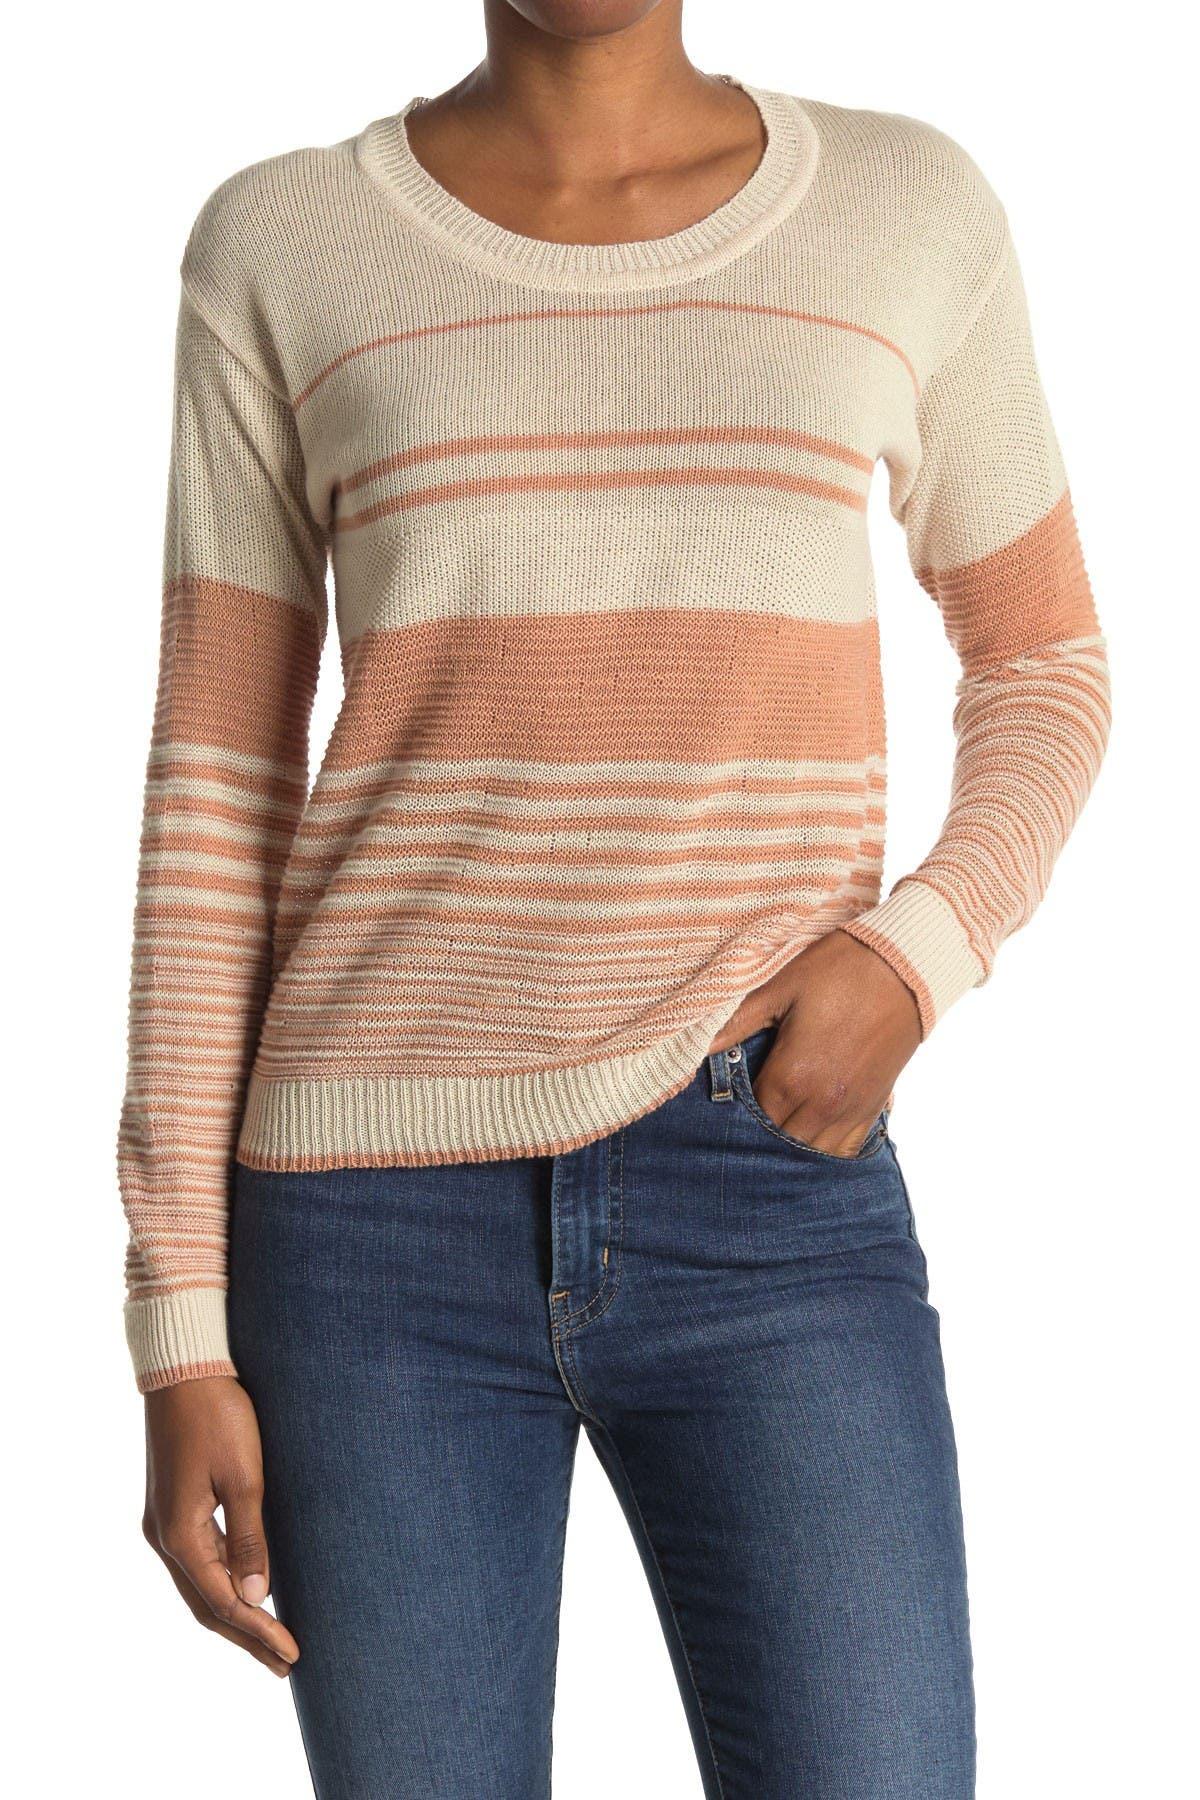 Image of Heartloom Lightweight Stripe Pullover Sweater